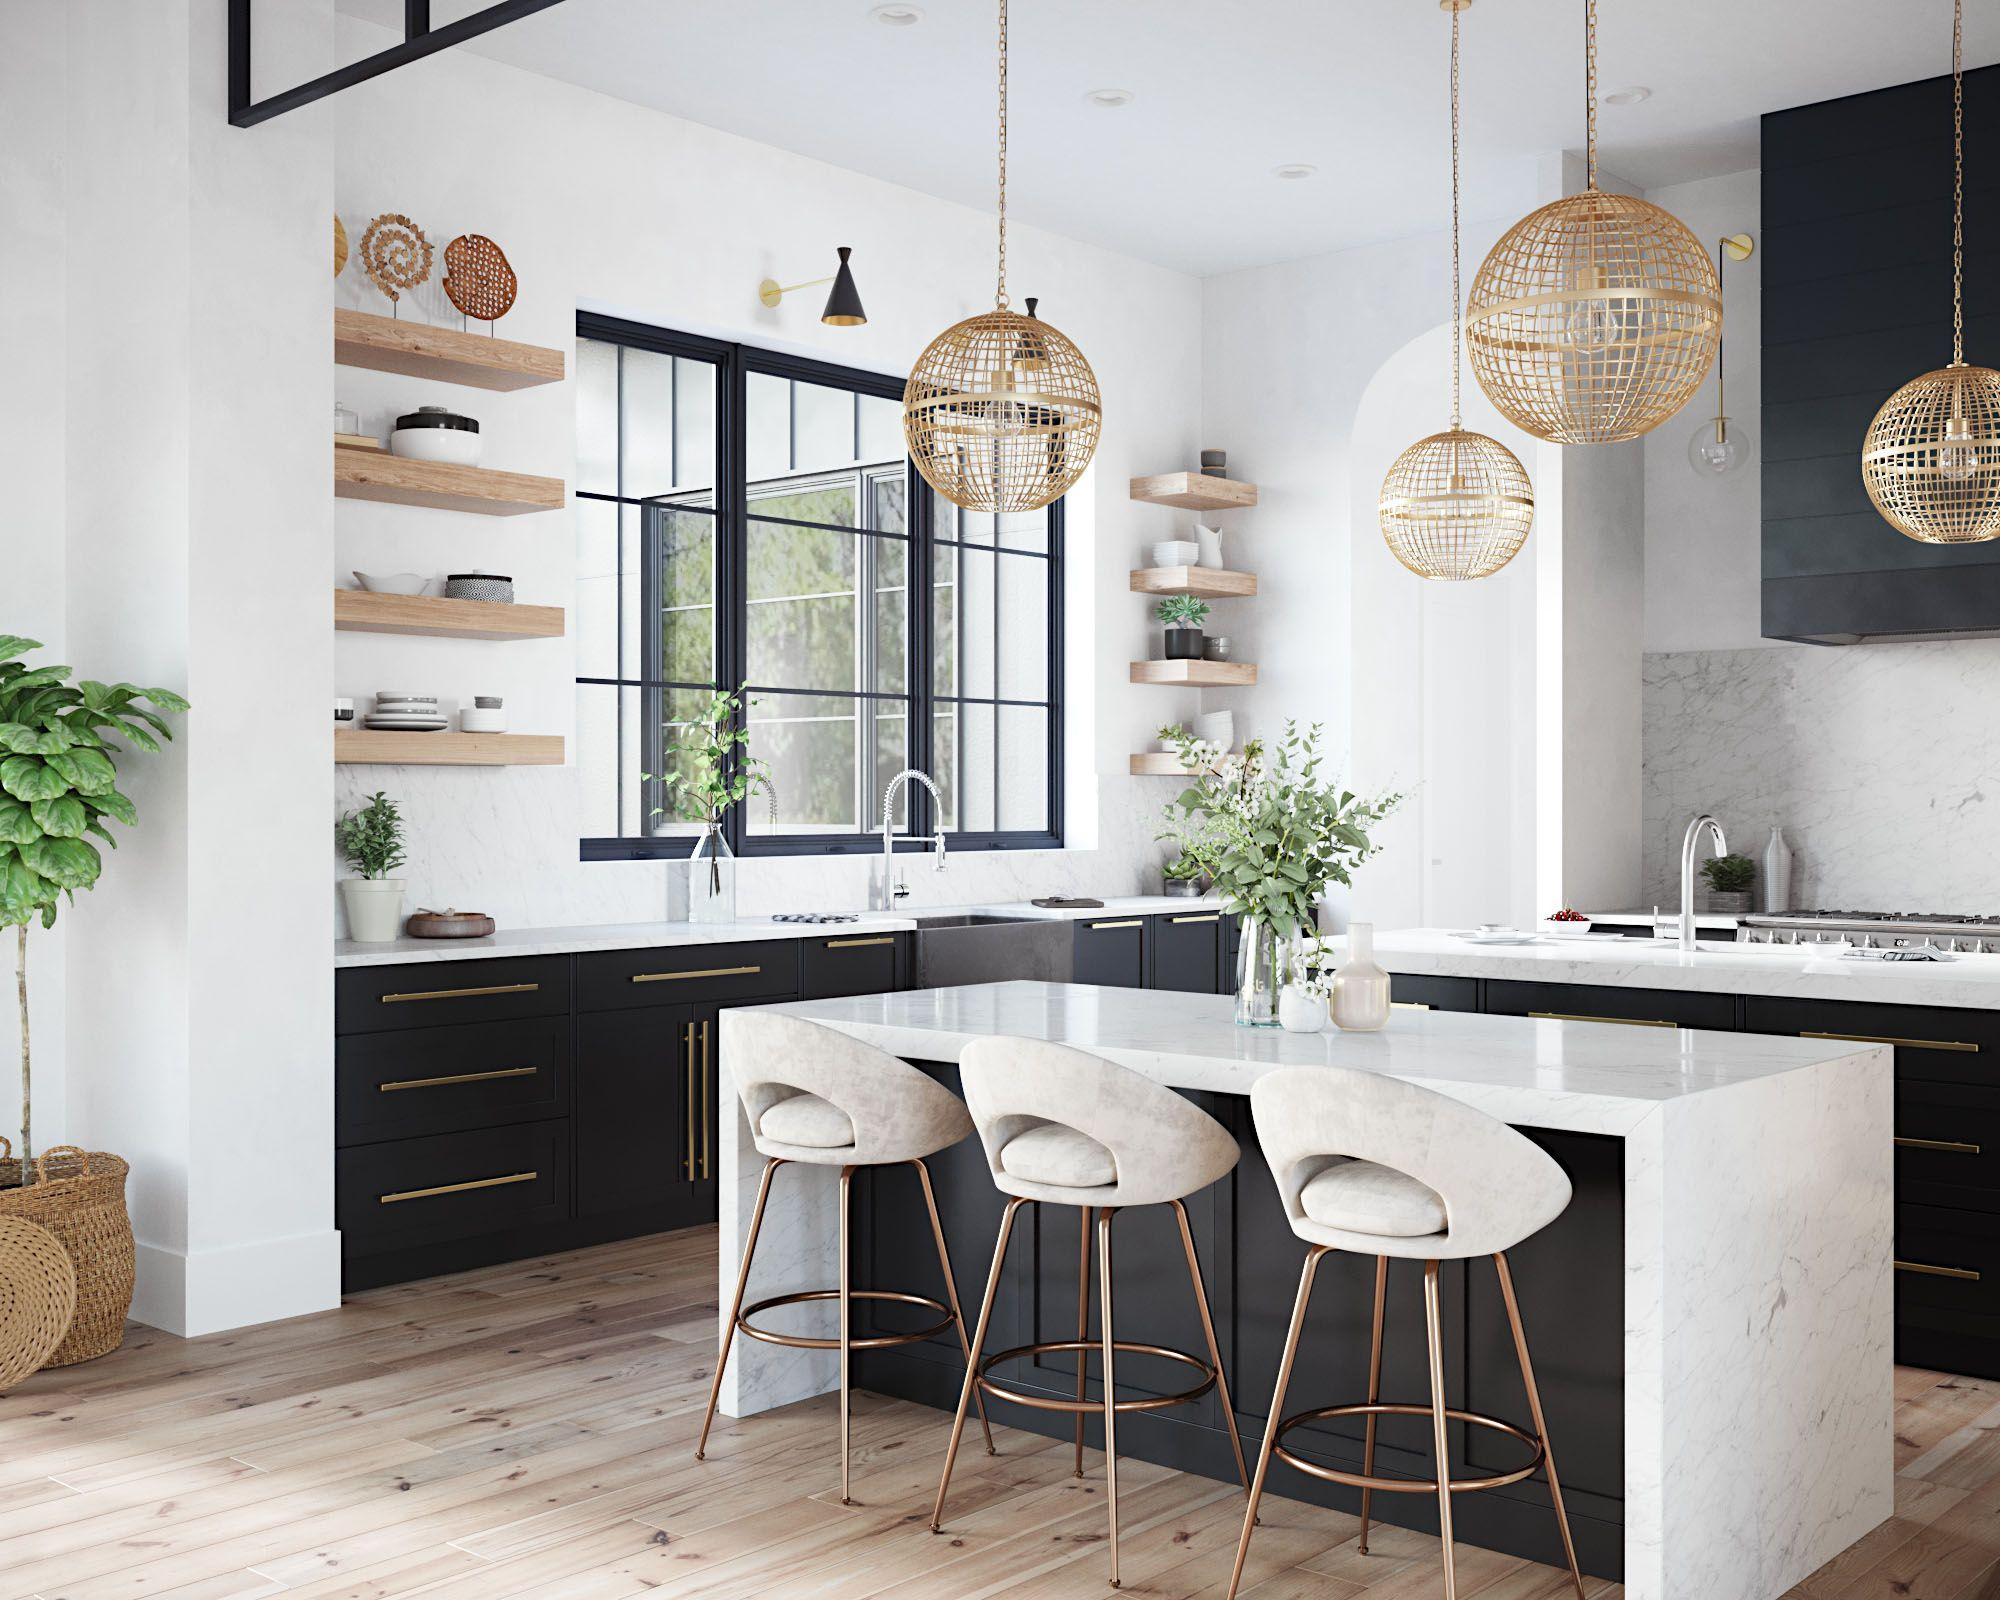 Nskq3320 S Farmhouse Quartet Kitchen Sink In Slate Contemporary Home Decor Kitchen Design Trends Home Decor